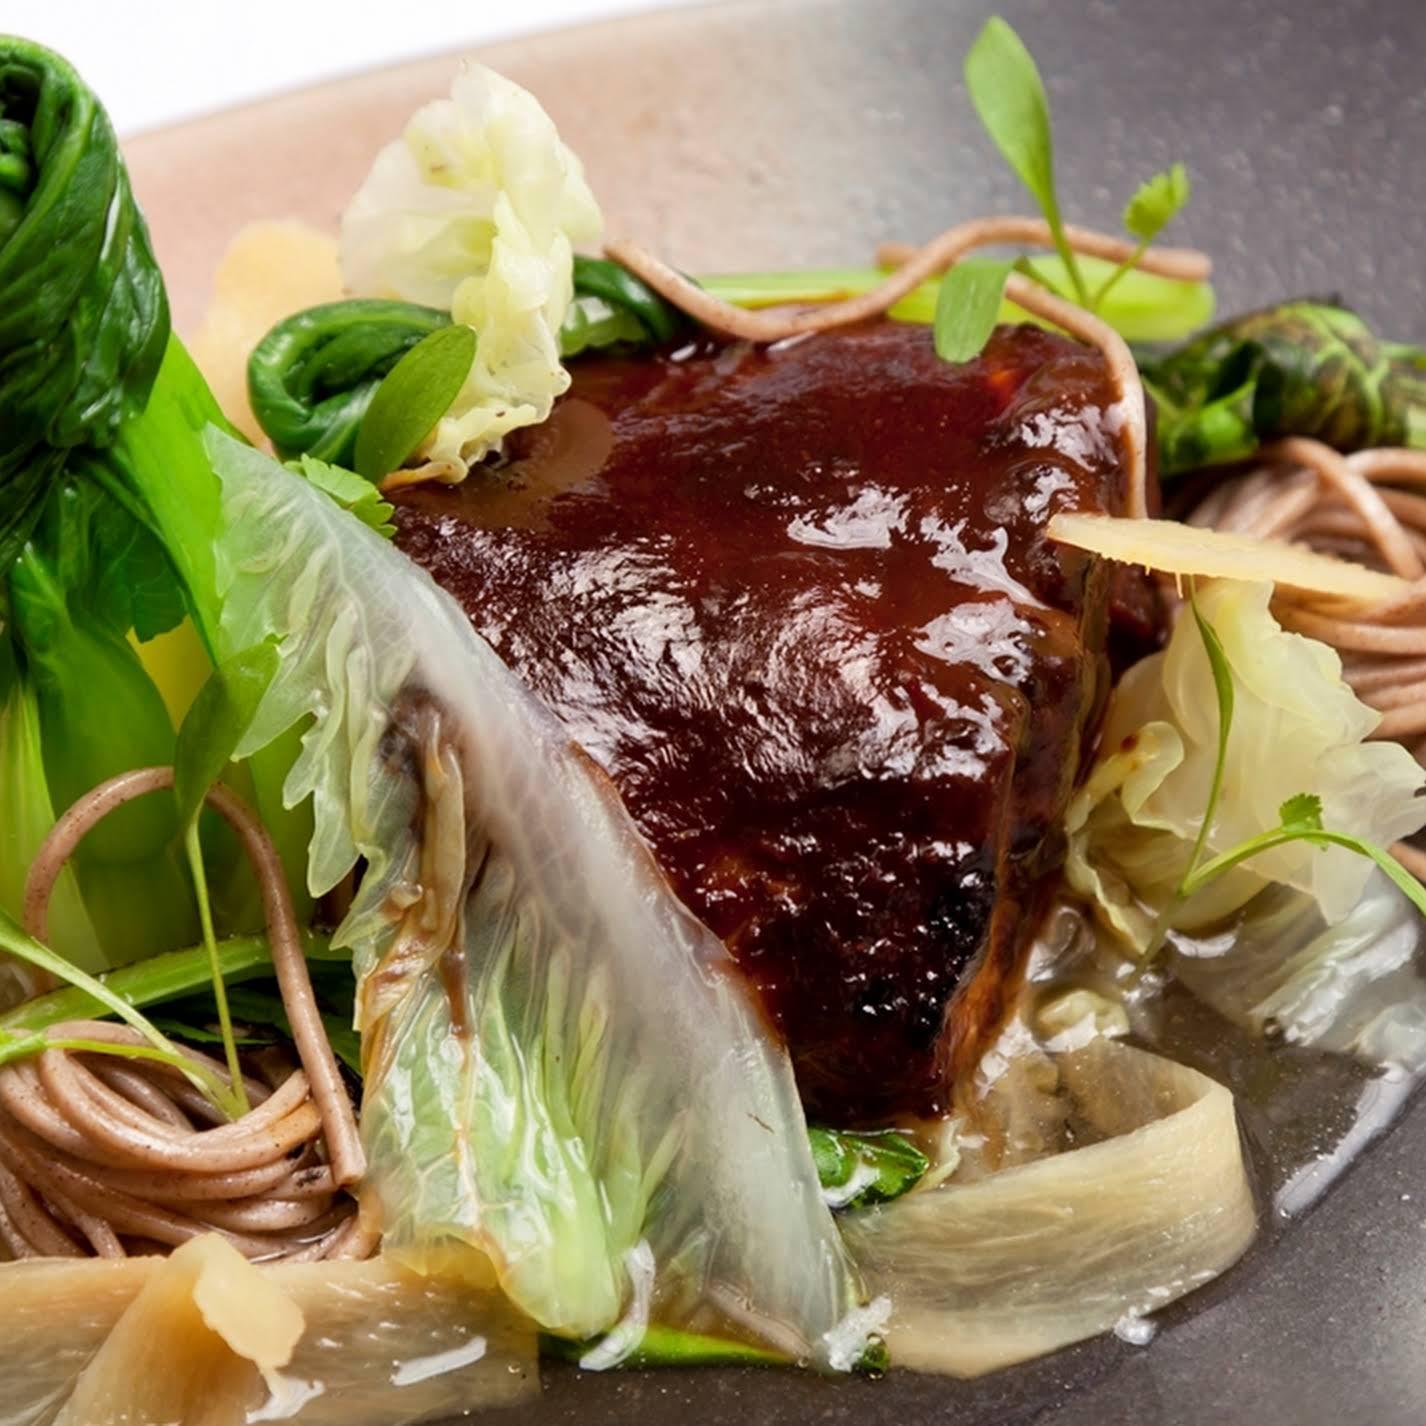 Miso-Marinated Black Cod, Soba Noodles and Green Tea Broth